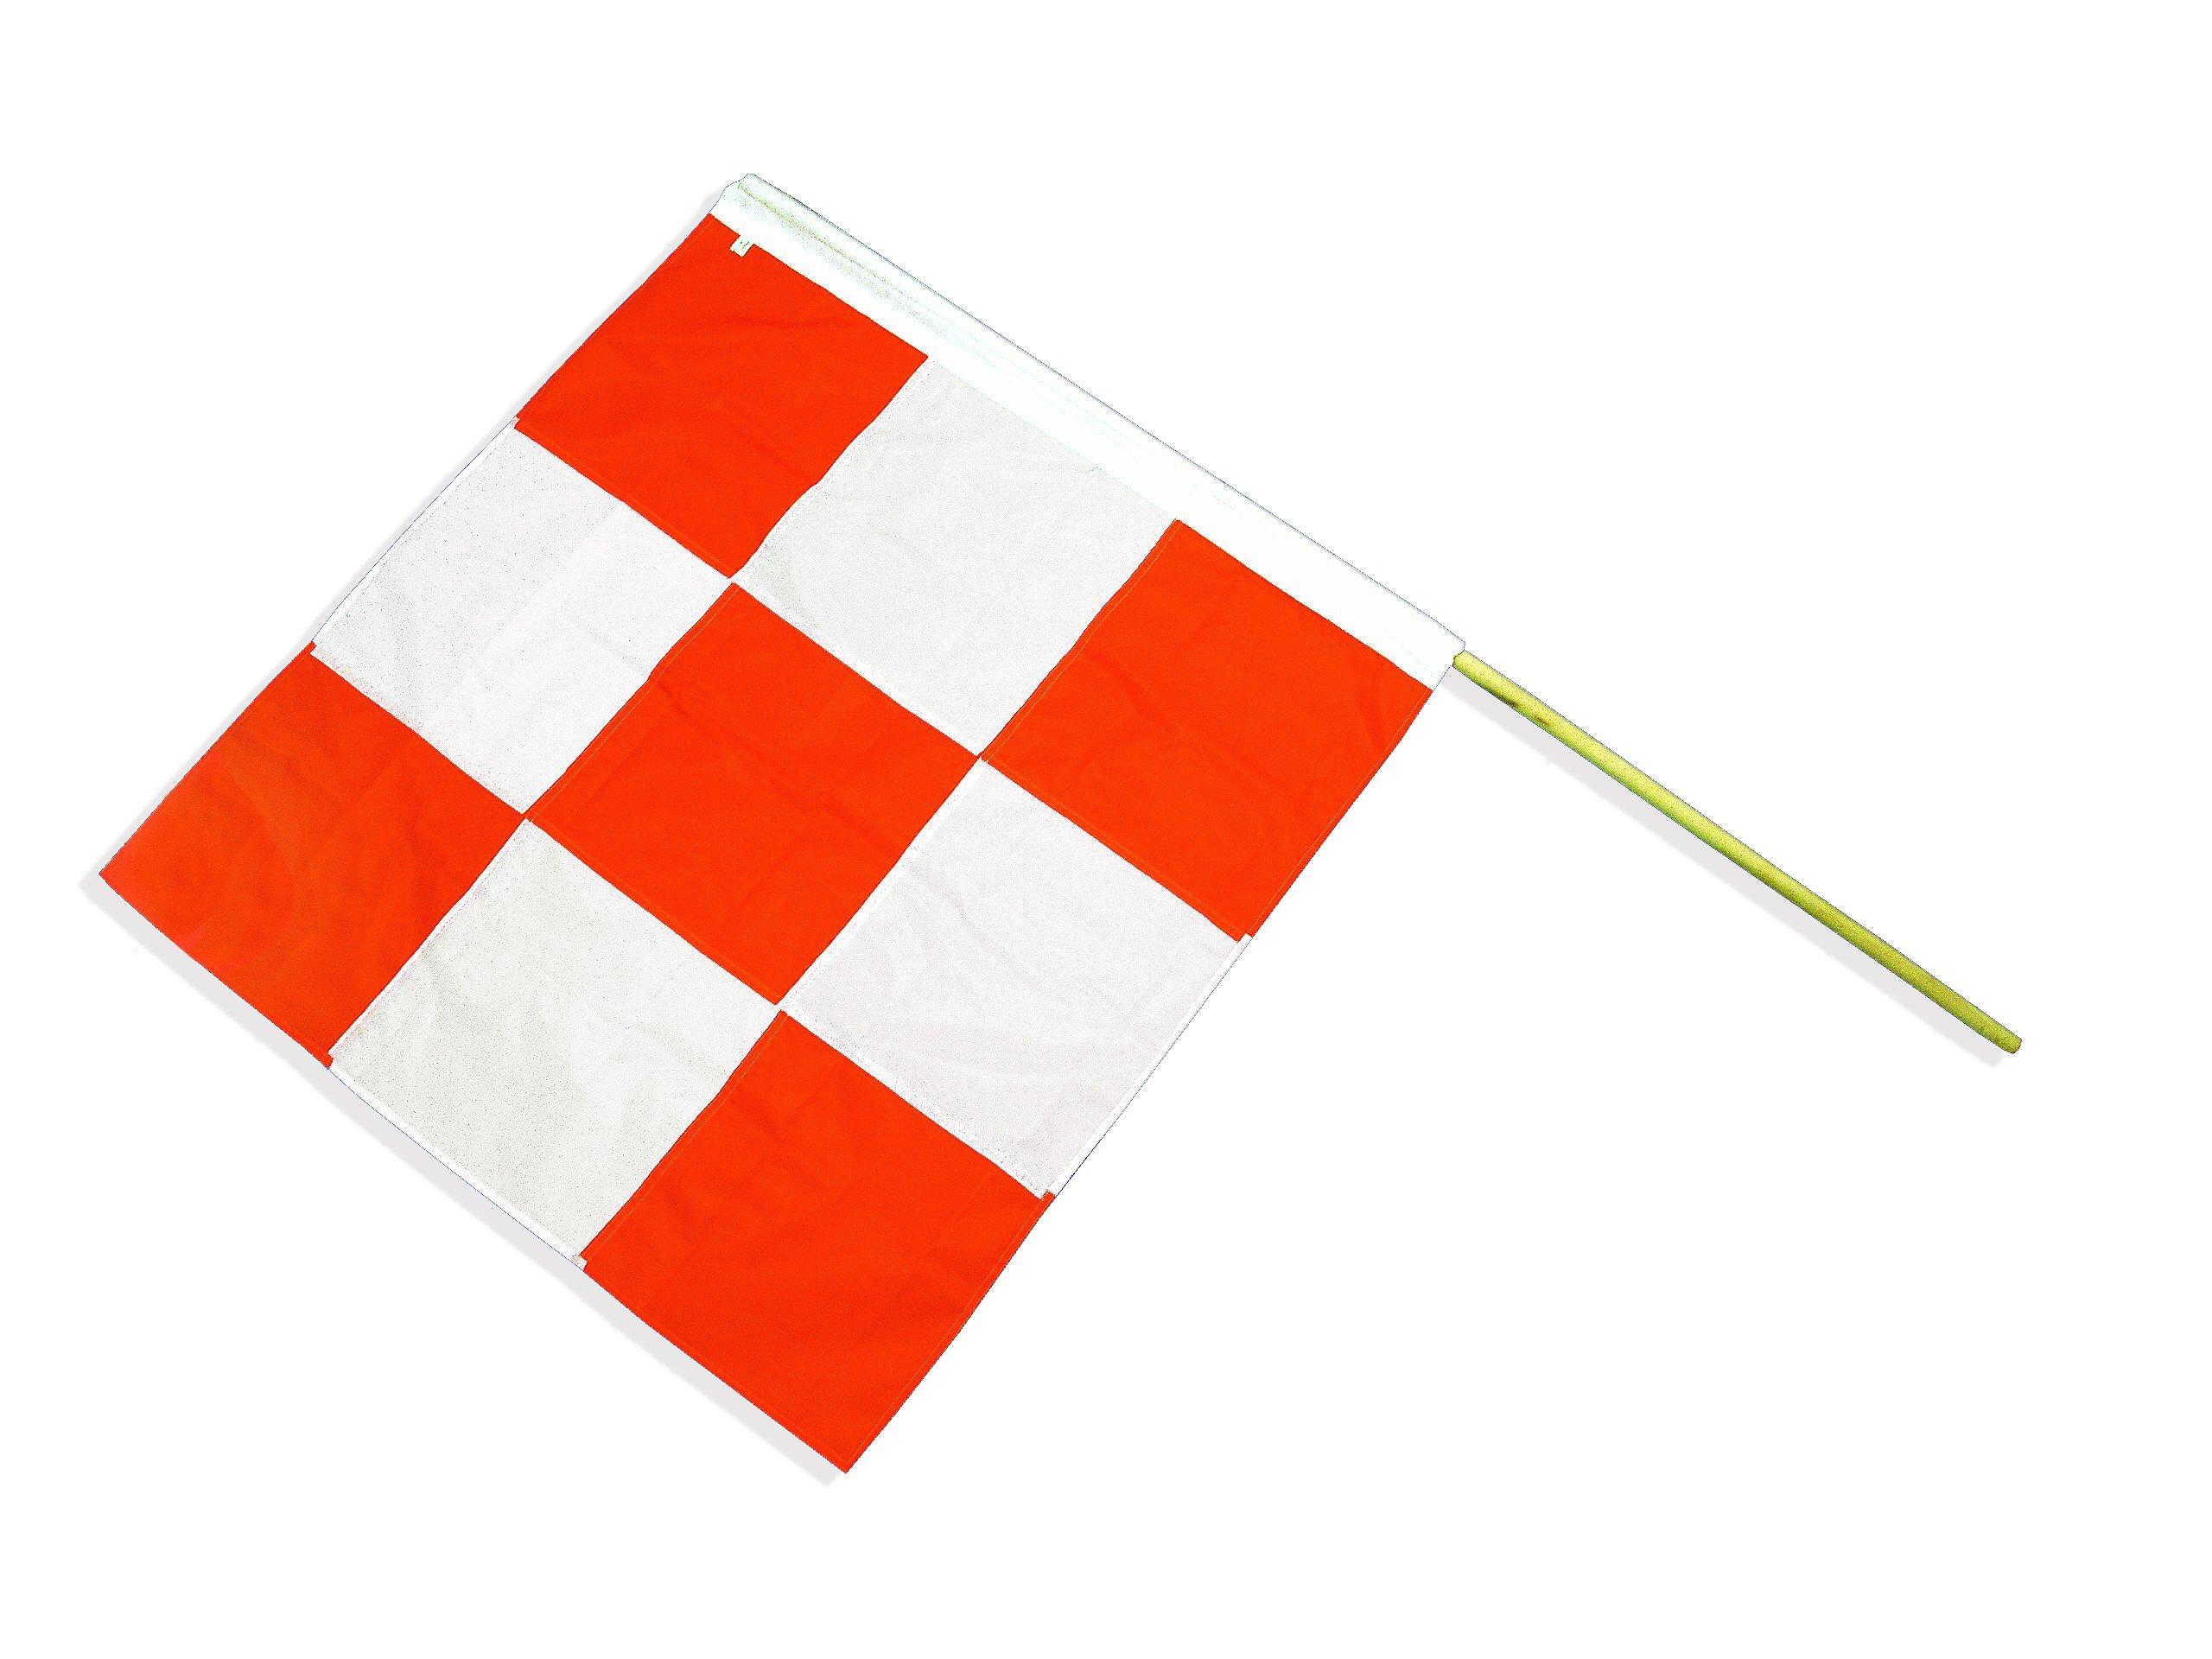 Mutual 14977-5 Heavy-Duty Nylon Airport Flag with 60'' Staff, 36'' Length x 36'' Width, Orange/White